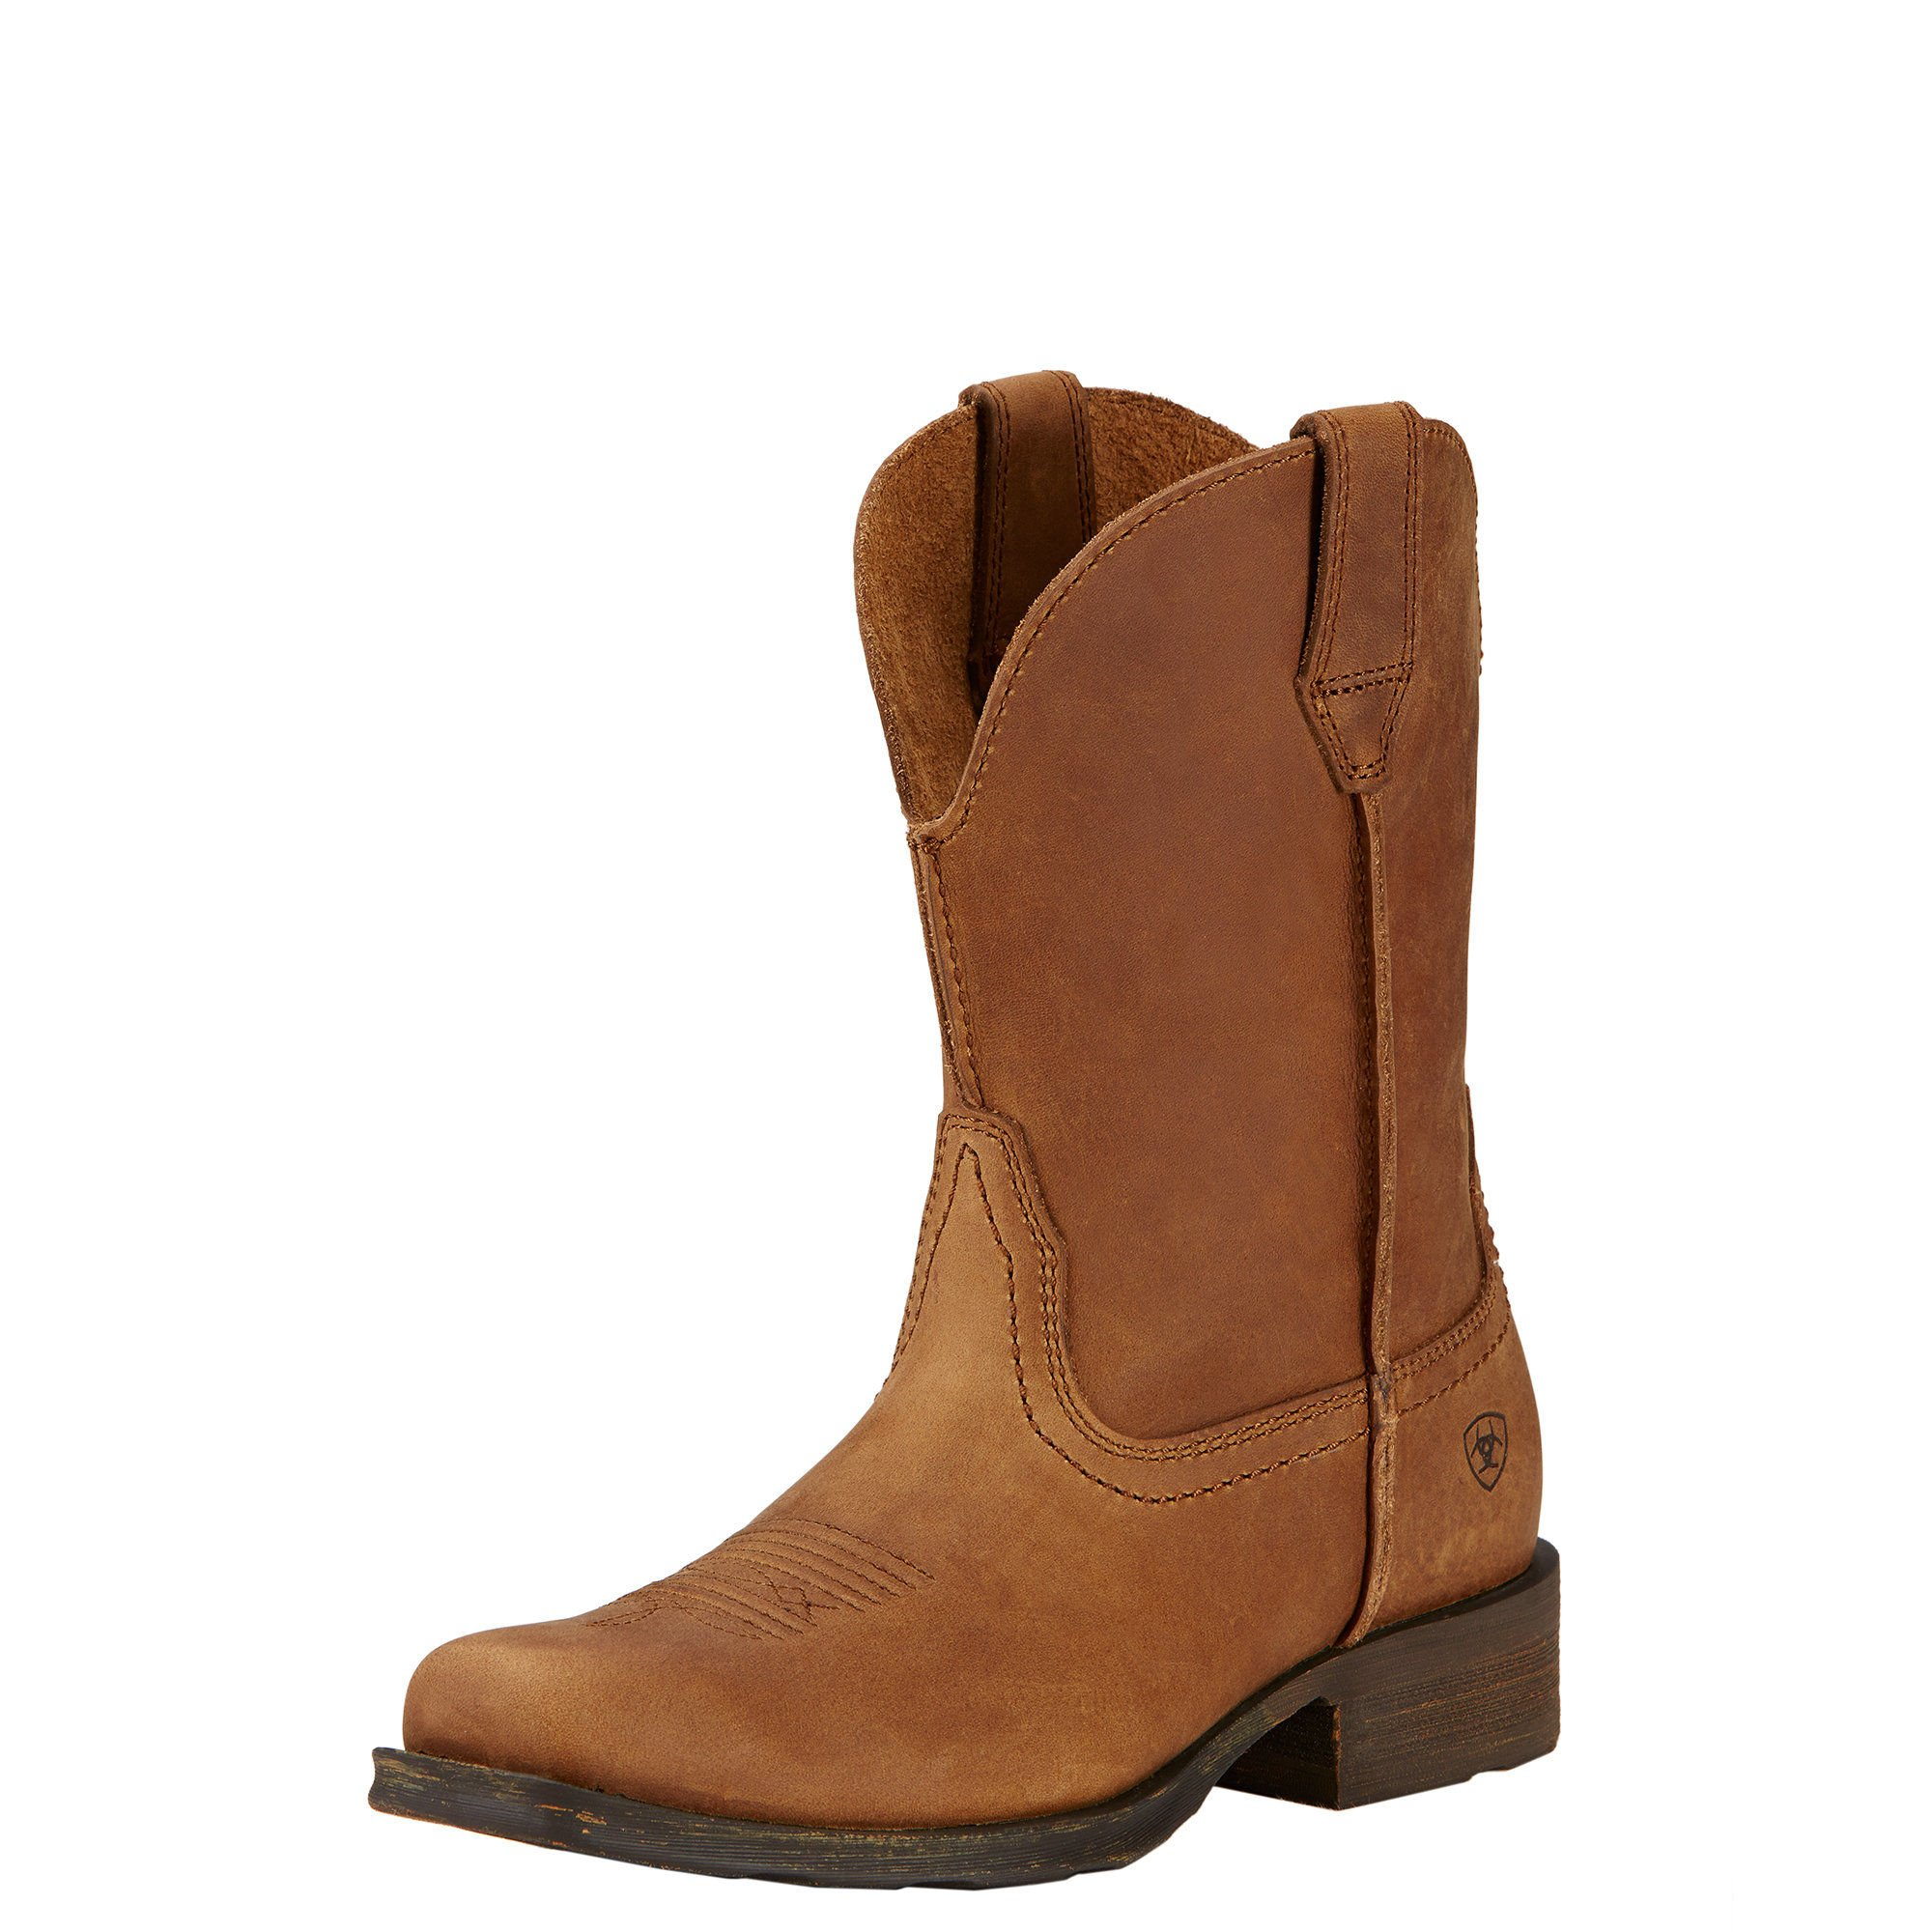 Ariat Women's Rambler Western Cowboy Boot, Dusted Brown, 9 B US